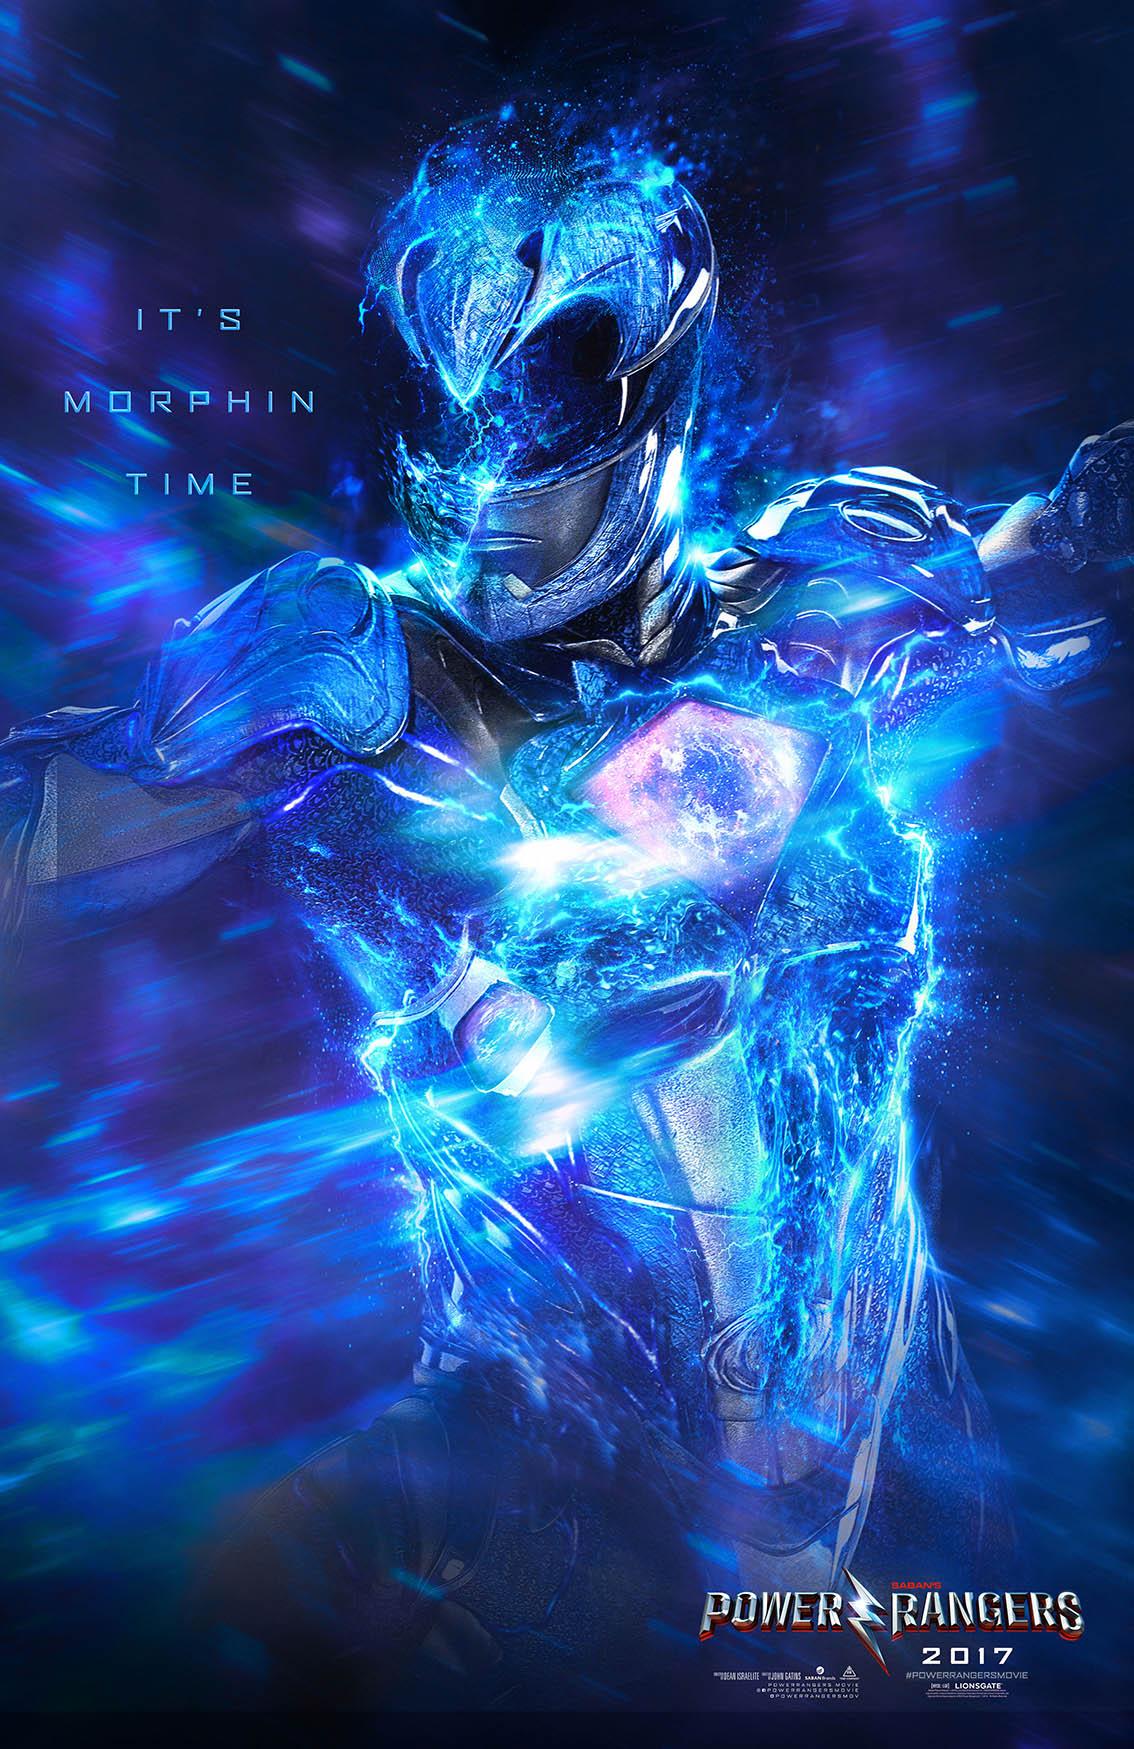 poster designs photoshop power rangers